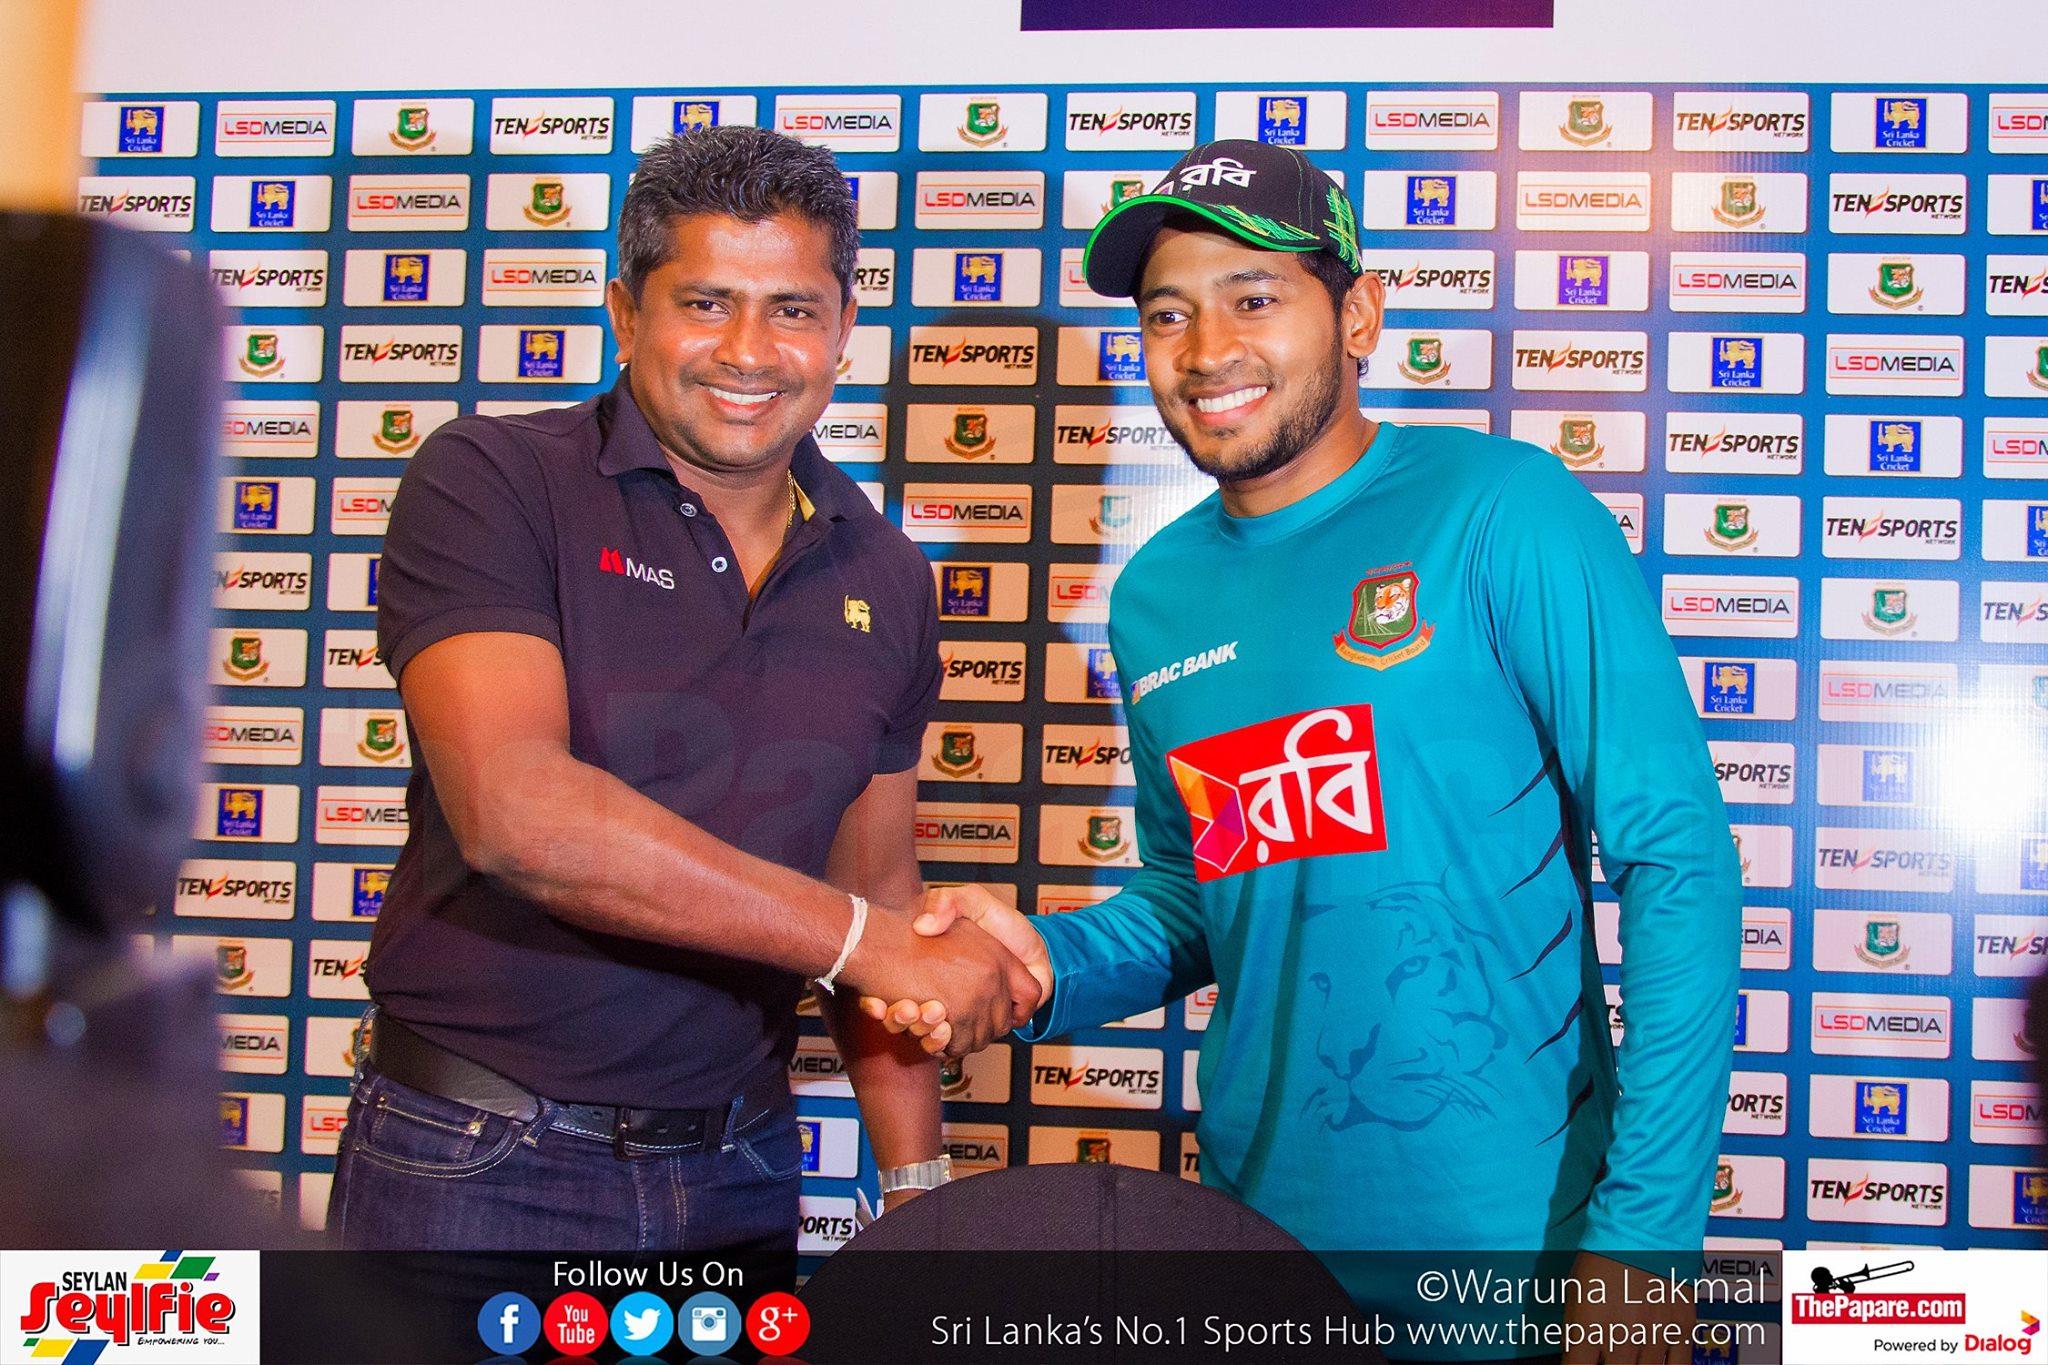 Bangladesh vs Sri Lanka - Press Conference Article